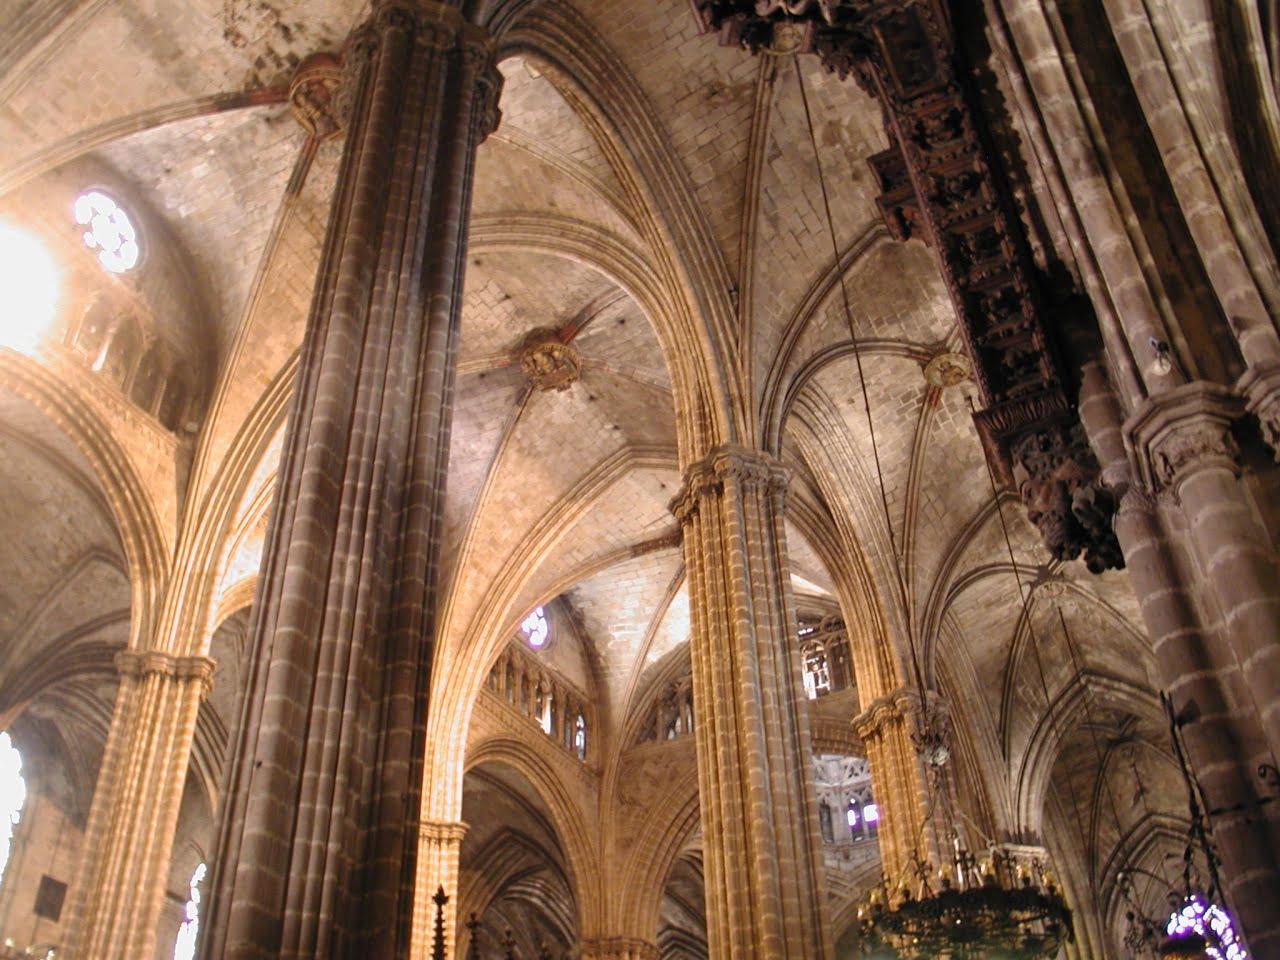 Columnas de la catedral for Catedral de barcelona interior